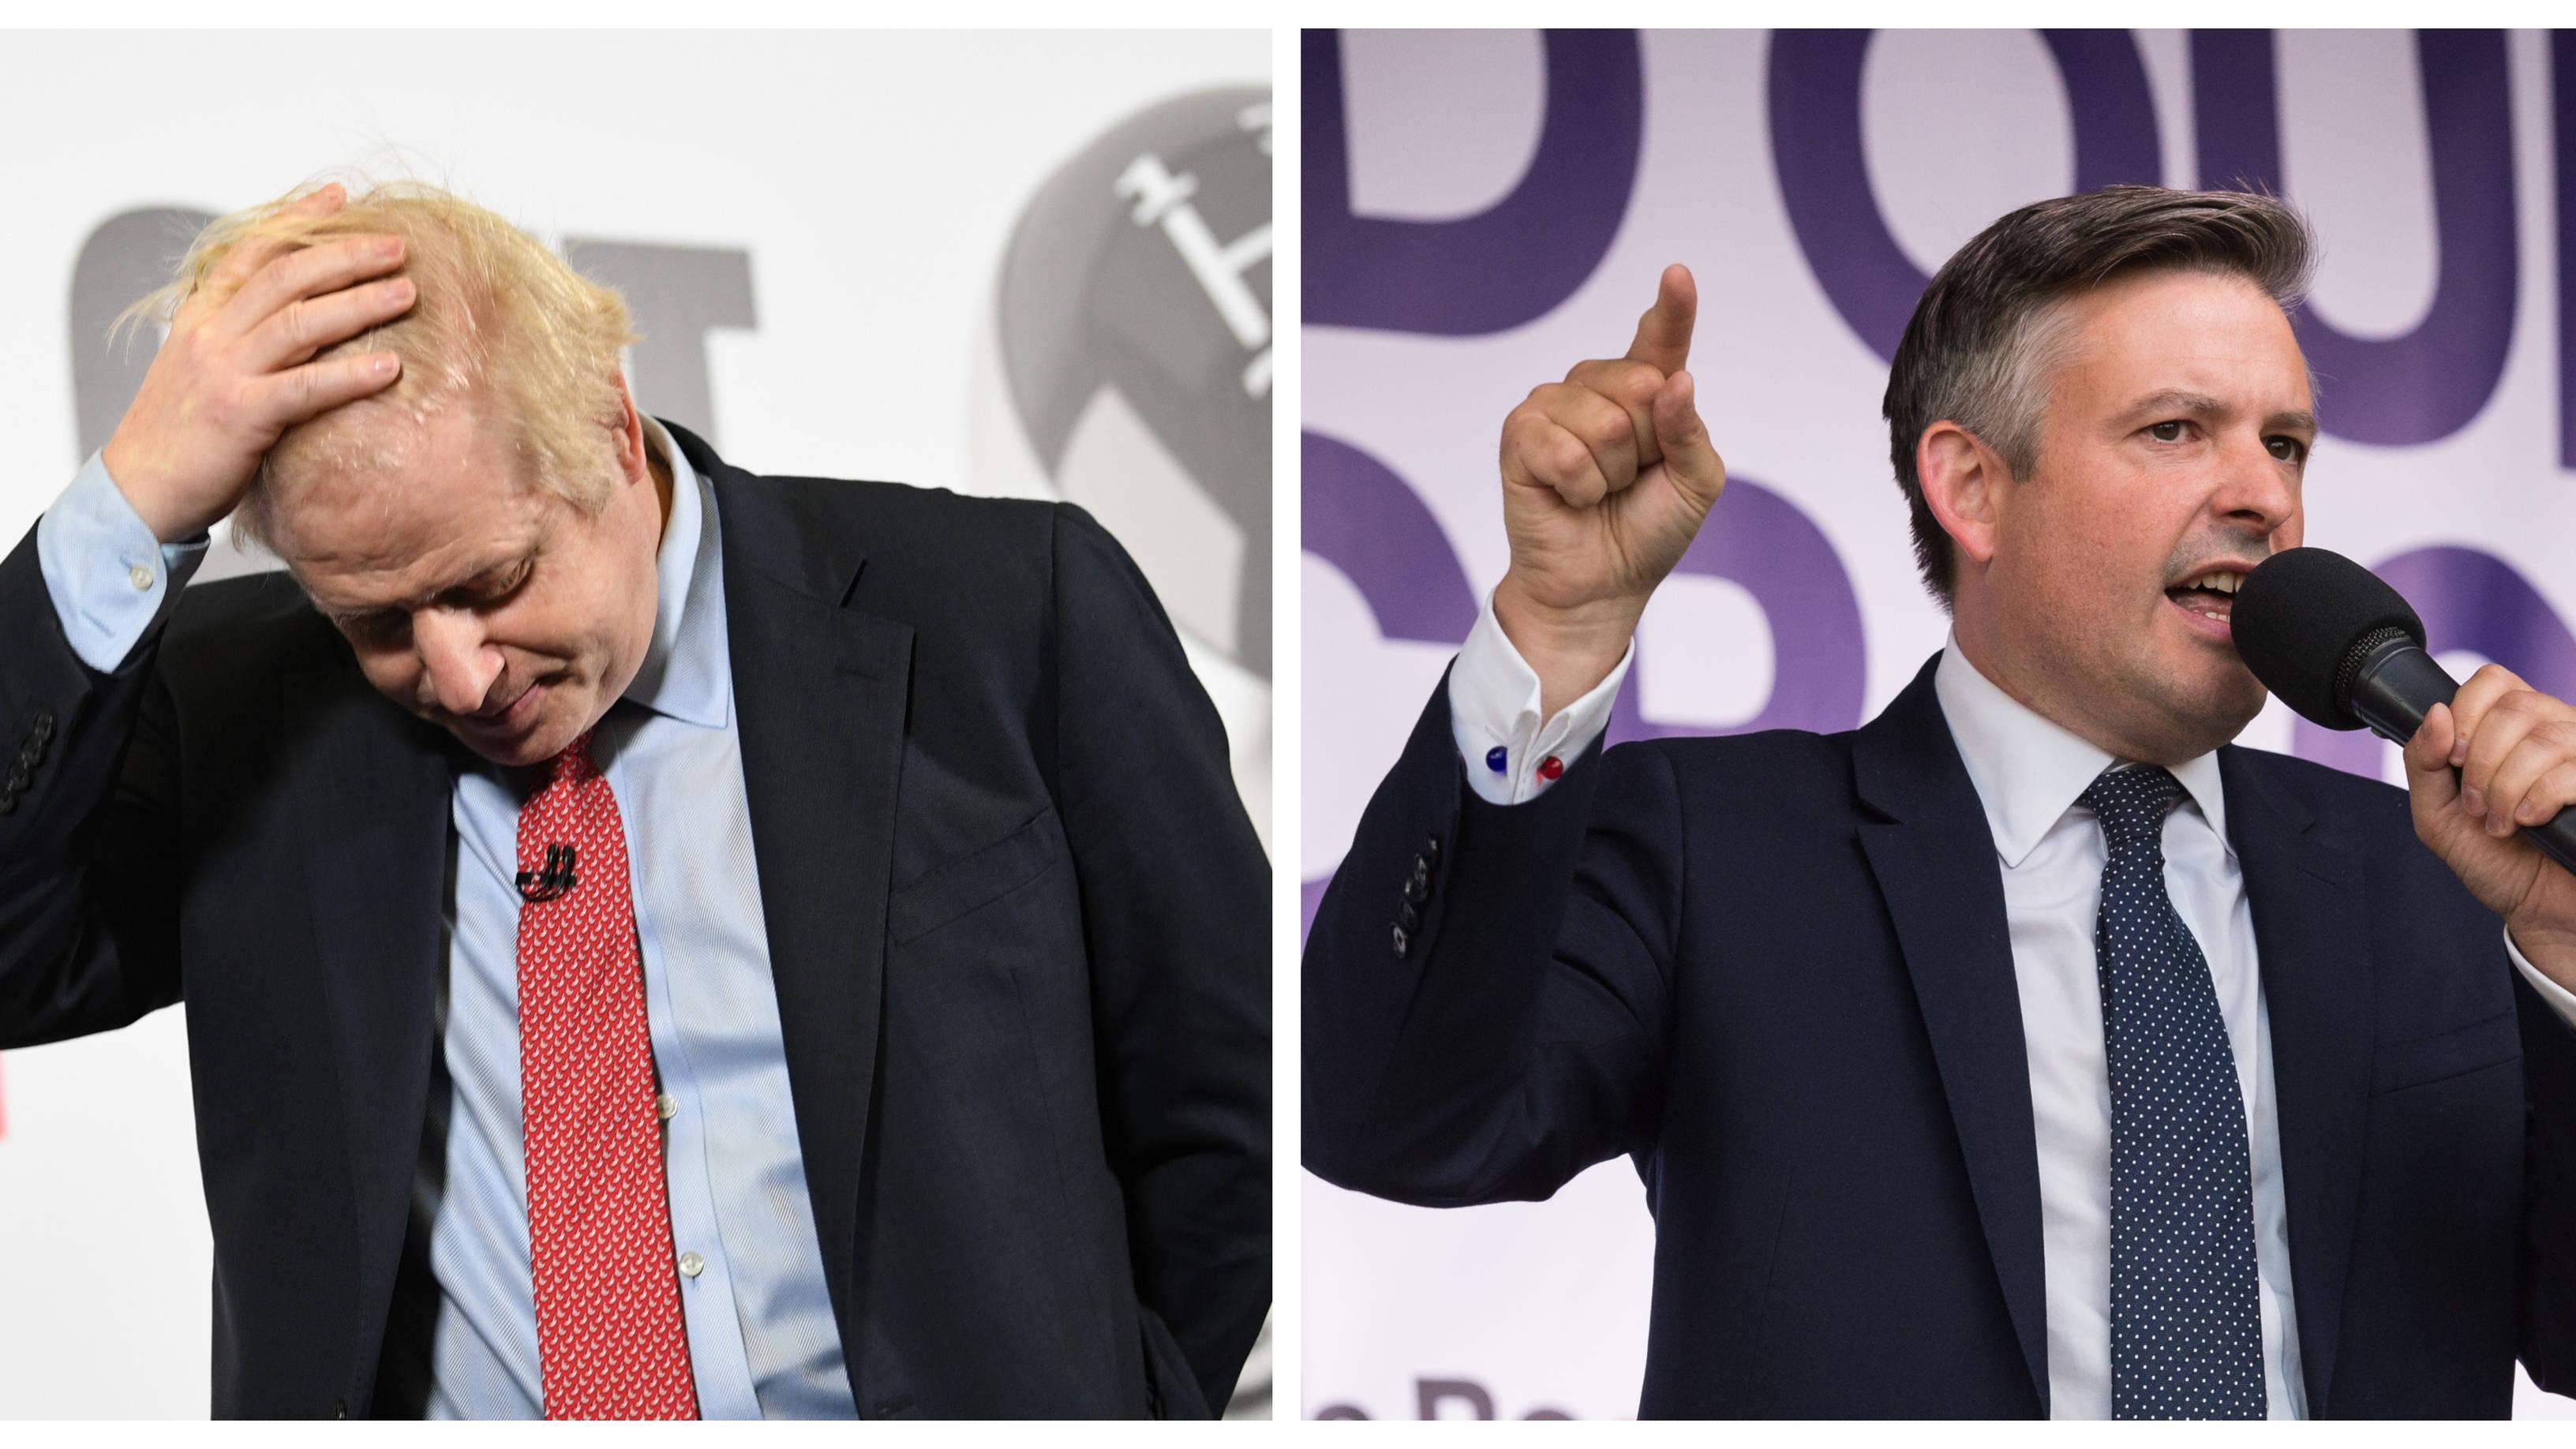 Boris Johnson accused of 'misleading' public over promises to reduce immigration